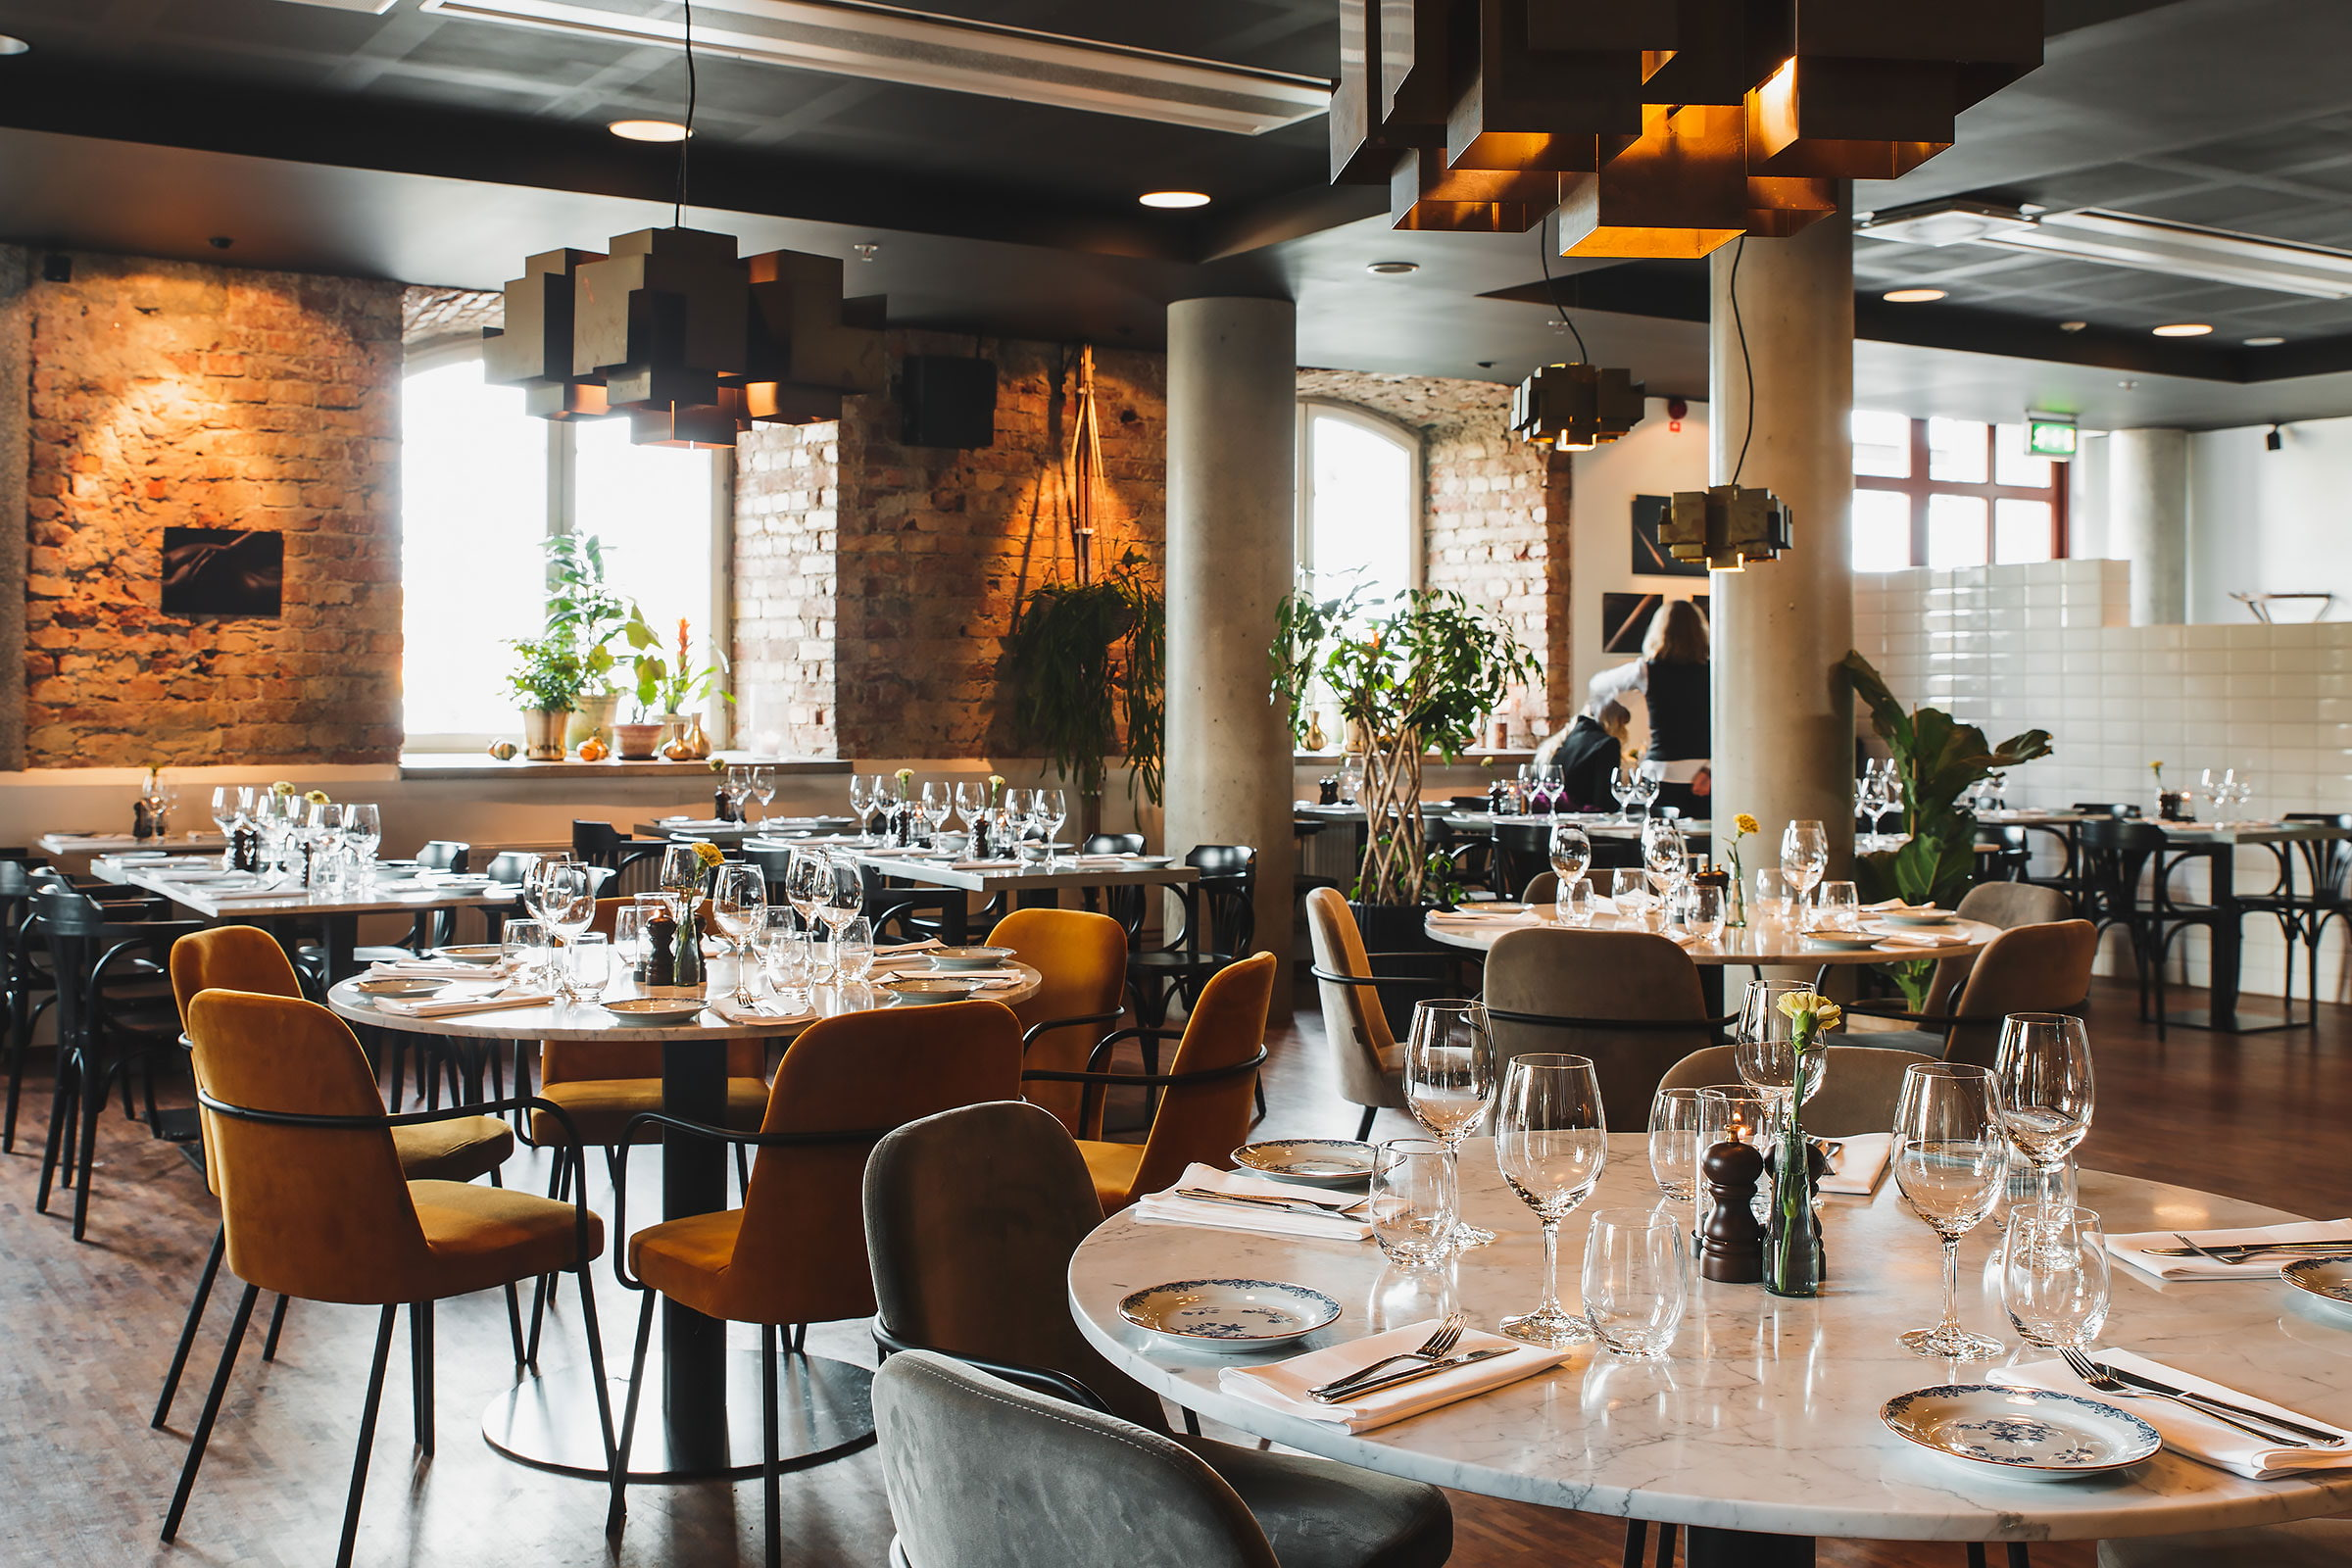 restaurang nära globen stockholm